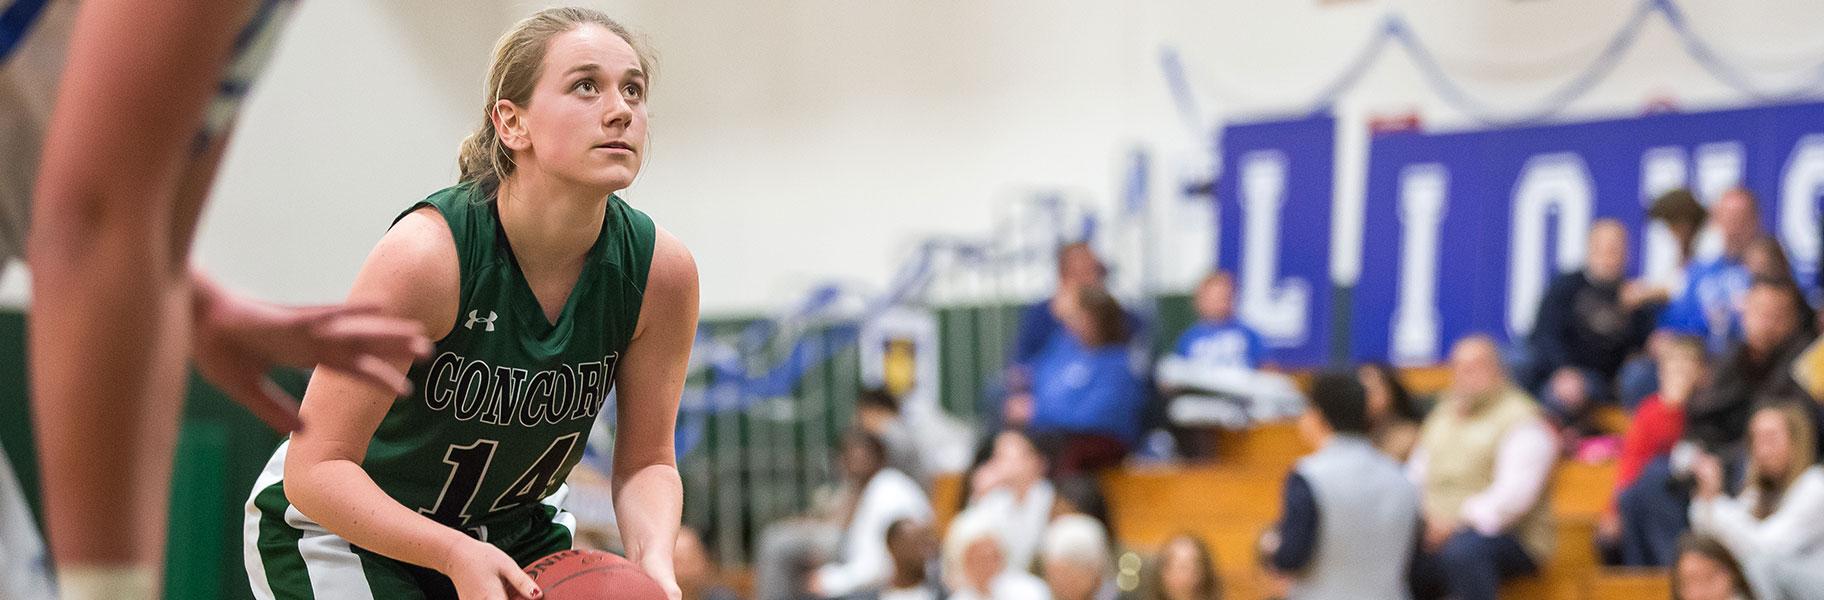 Girls Varsity Basketball at Concord Academy